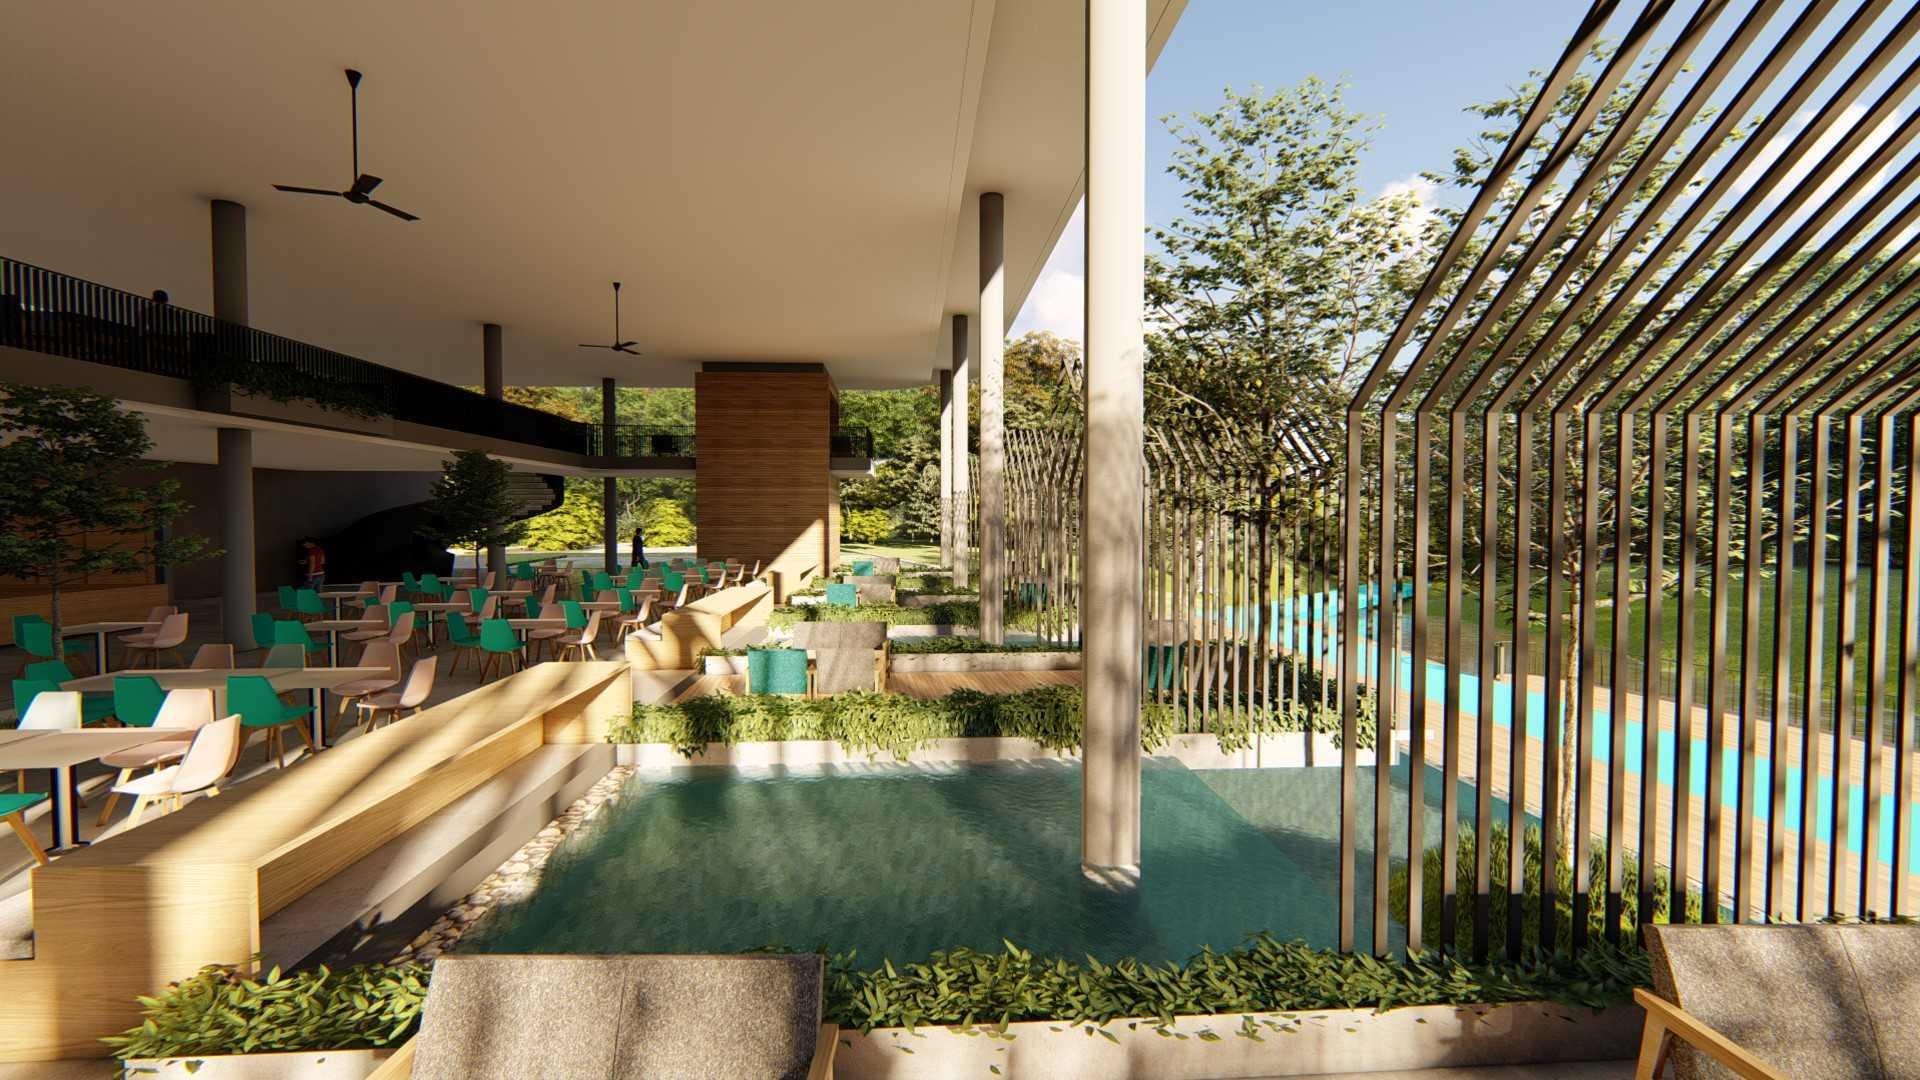 Moi Architects Food Villa Bogor, Jawa Barat, Indonesia Bogor, Jawa Barat, Indonesia Moi-Architects-Food-Villa  58561